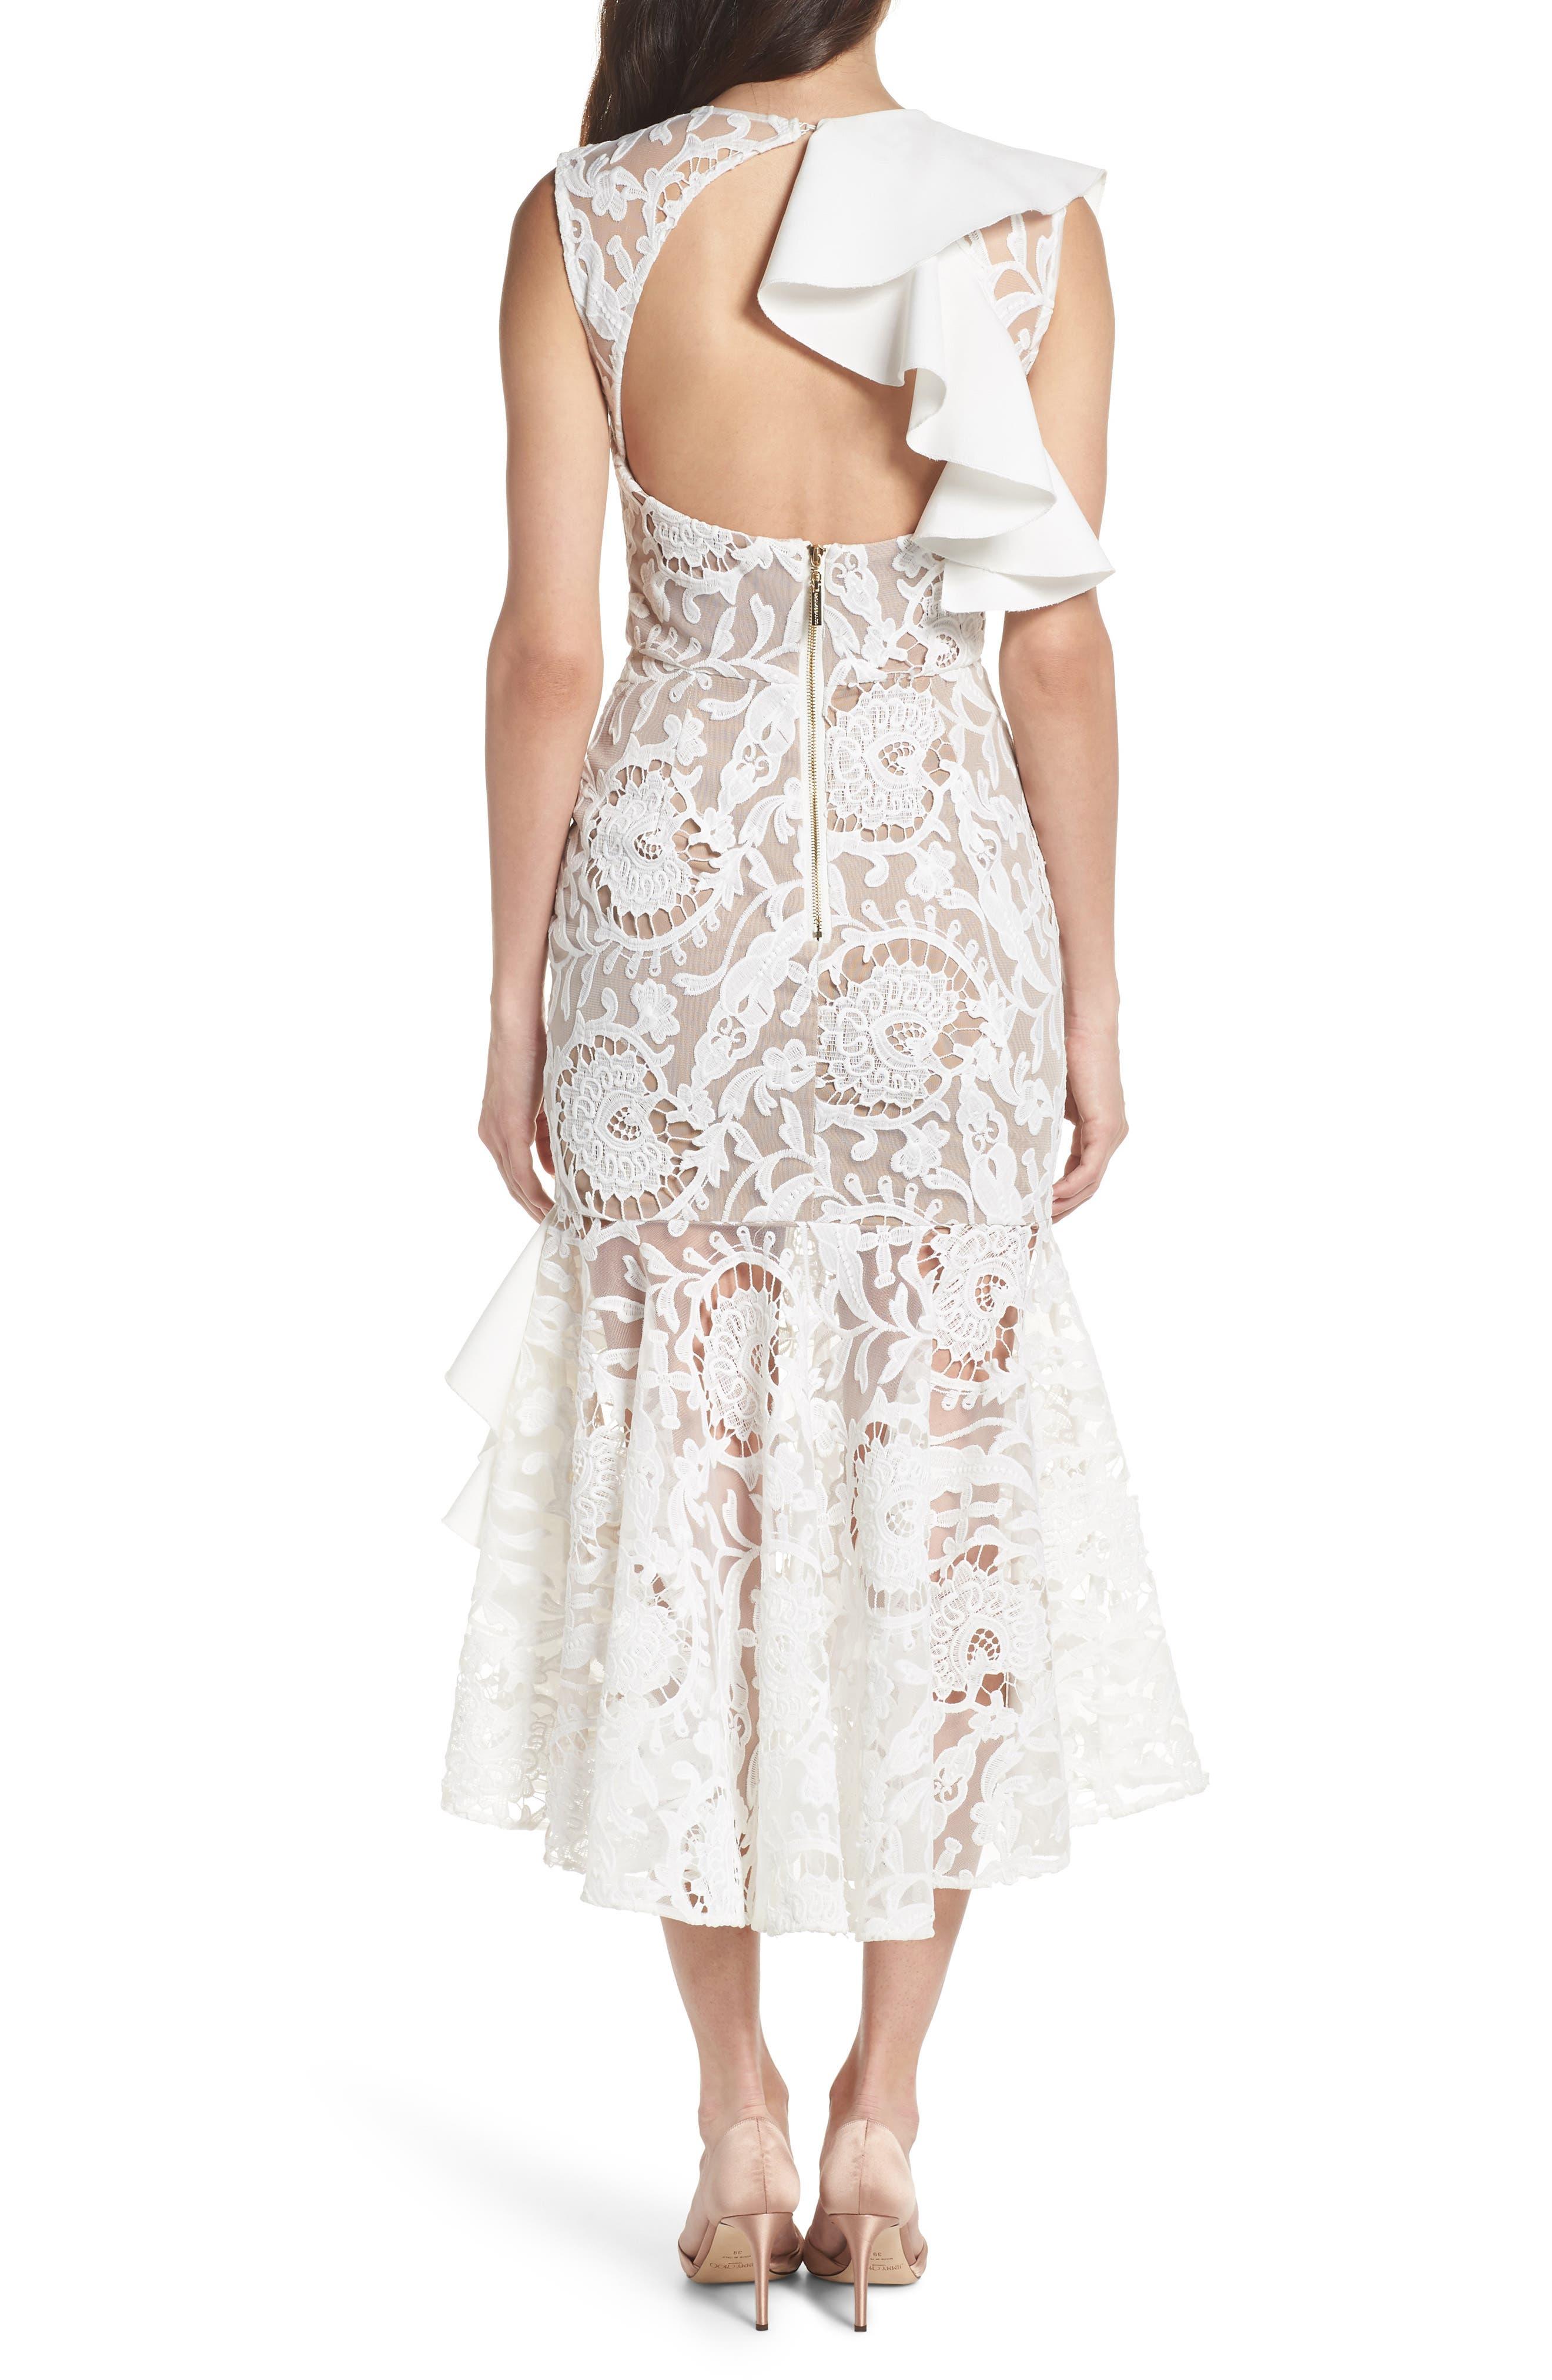 Rocha Waterfall Ruffle Lace Midi Dress,                             Alternate thumbnail 2, color,                             900